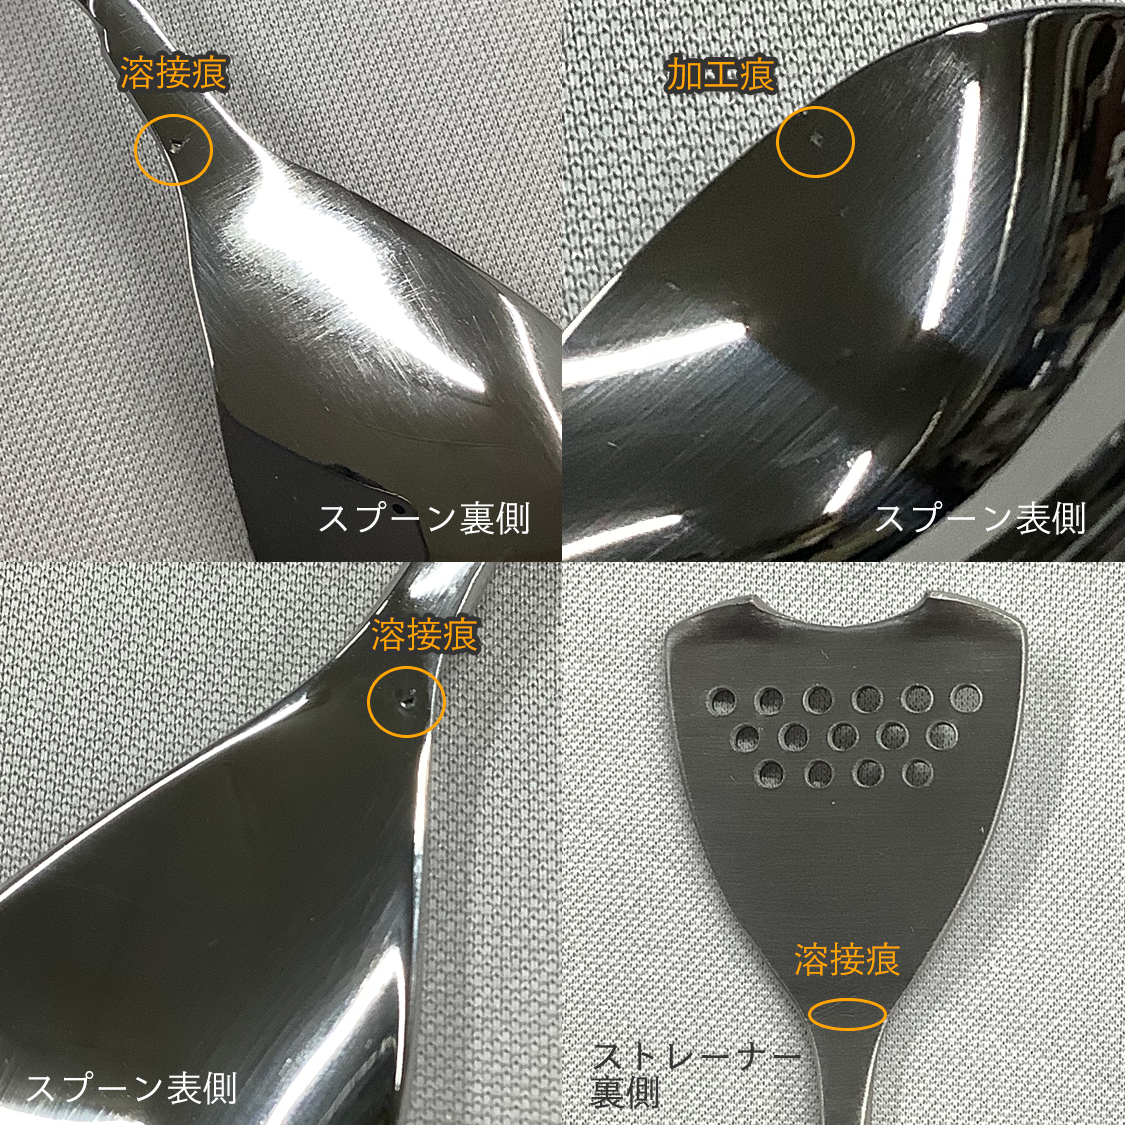 【BIRDY. アウトレットセール】BS400 バースプーン 400mm B品